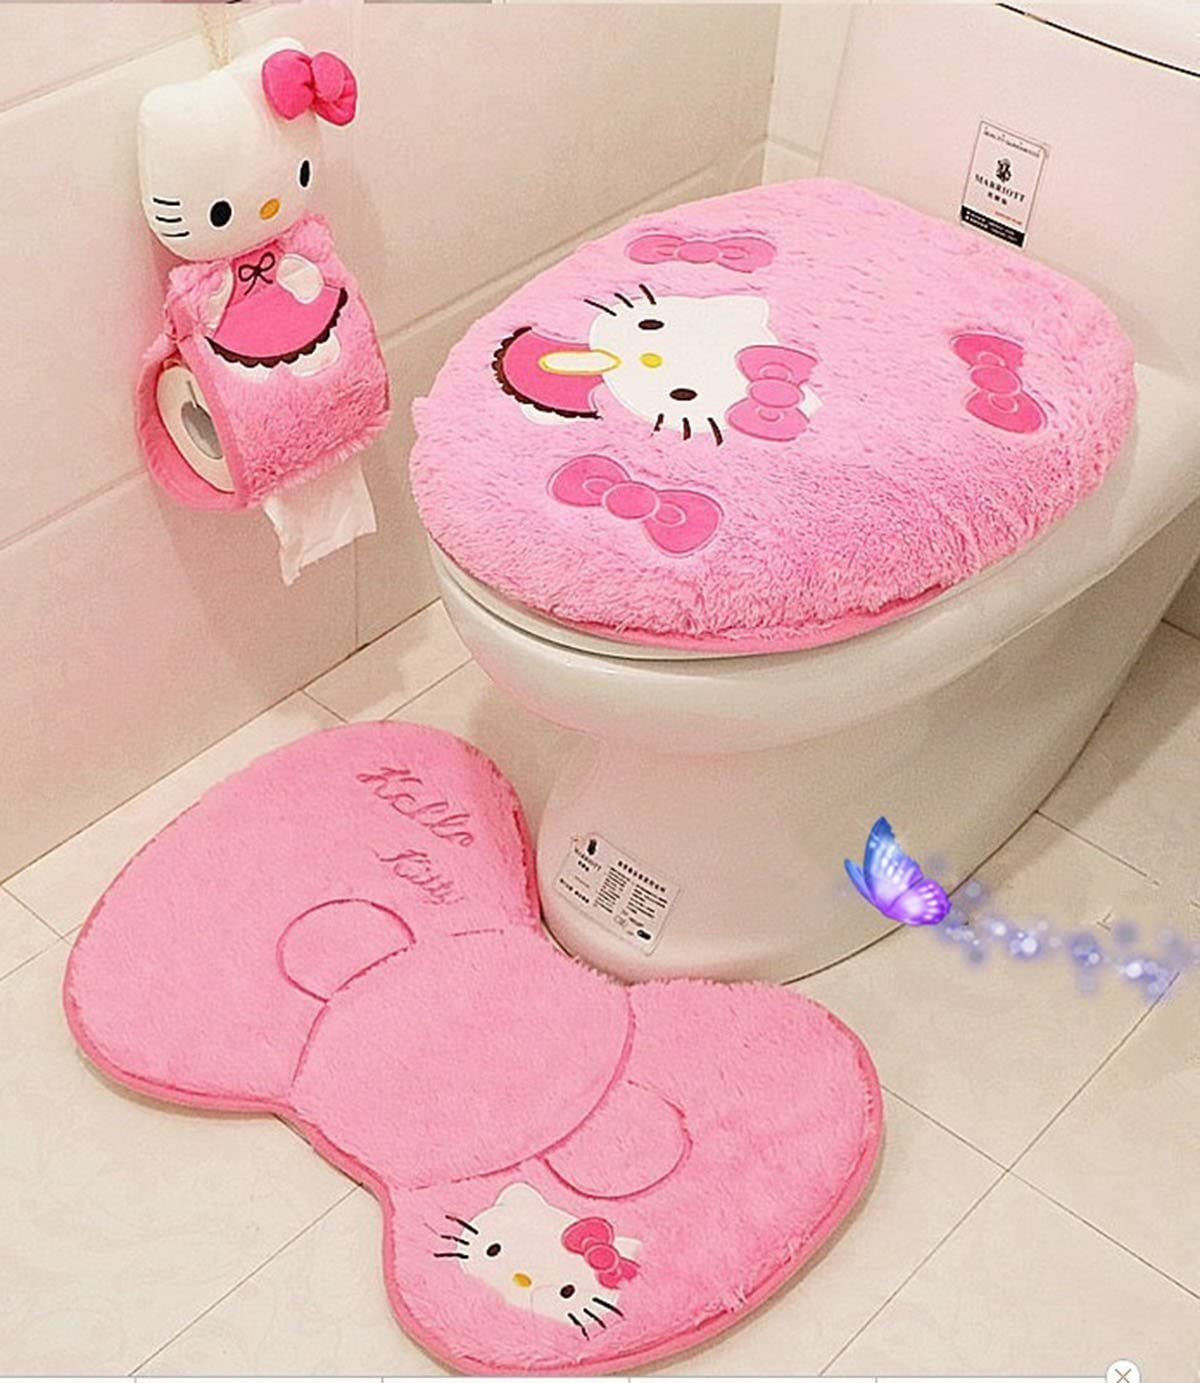 Ikeelife Cute Hello Kitty Bathroom Pedestal Mat Cotton Non Slip